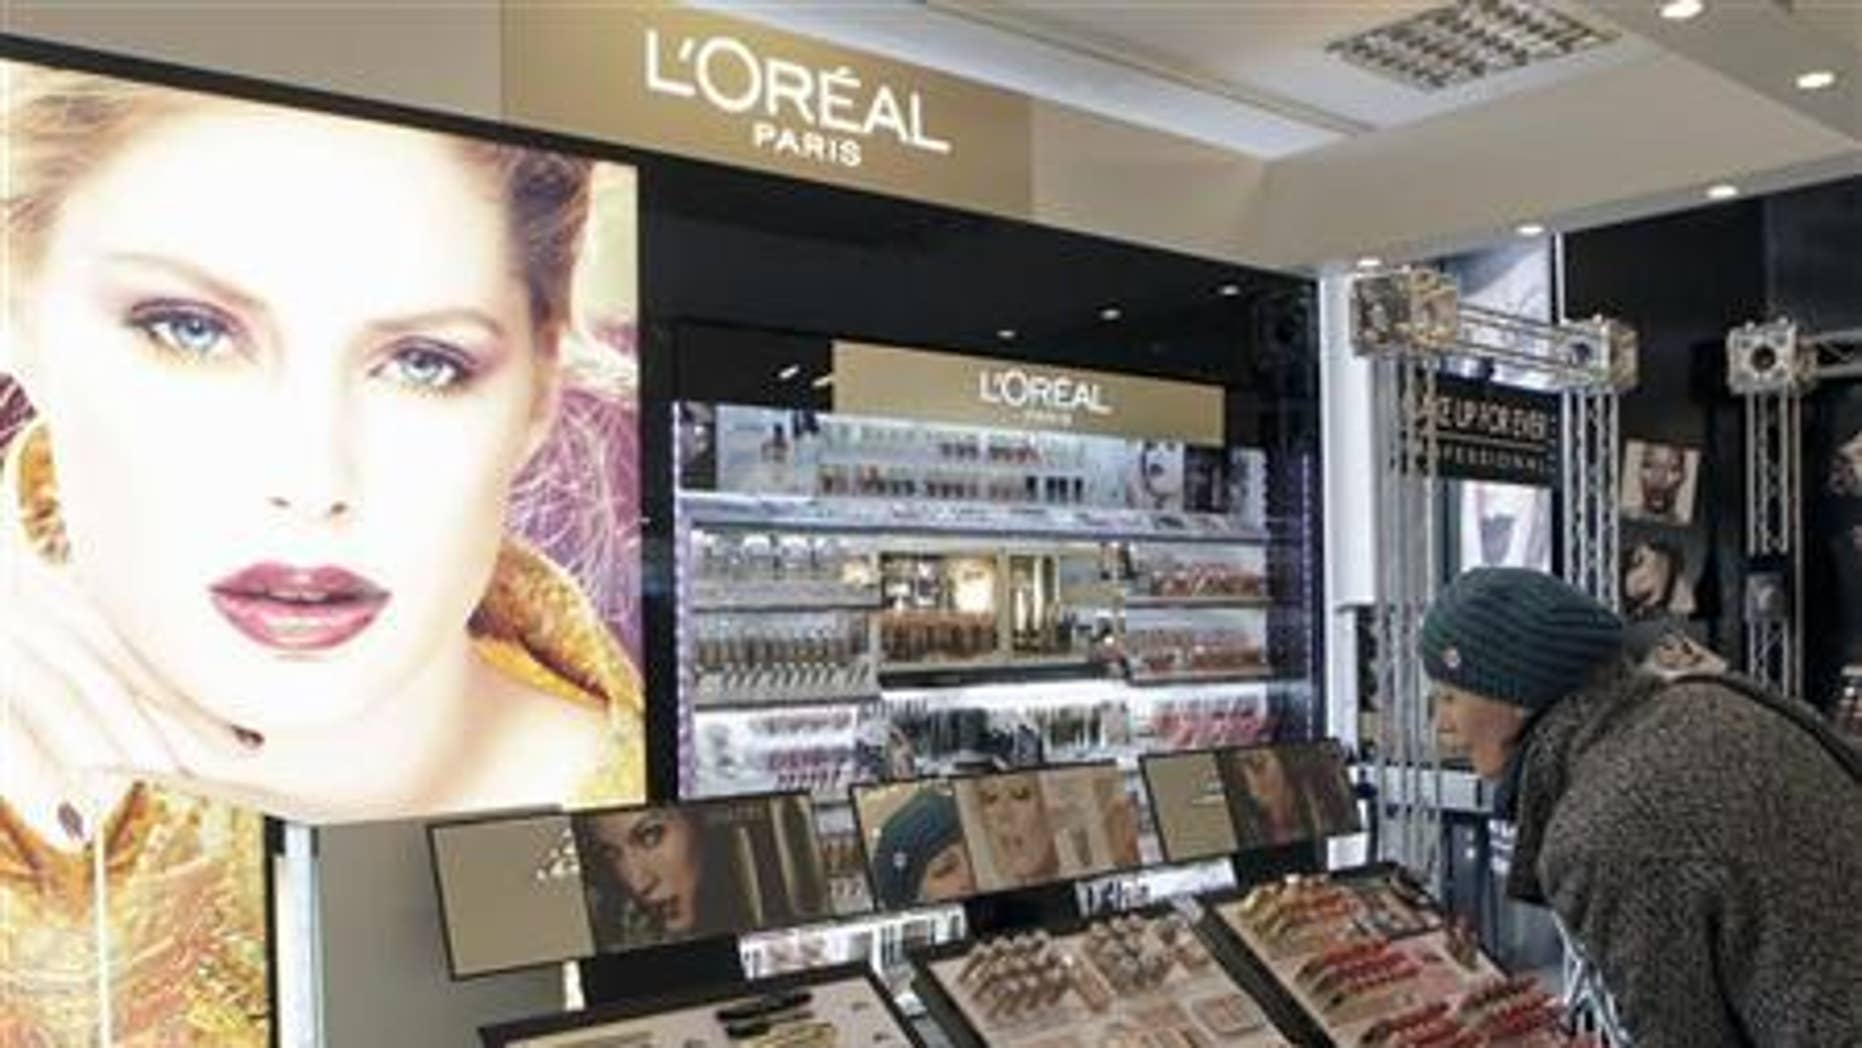 A woman looks at L'Oreal cosmetics in the shop in Riga April 13, 2012. REUTERS/Ints Kalnins